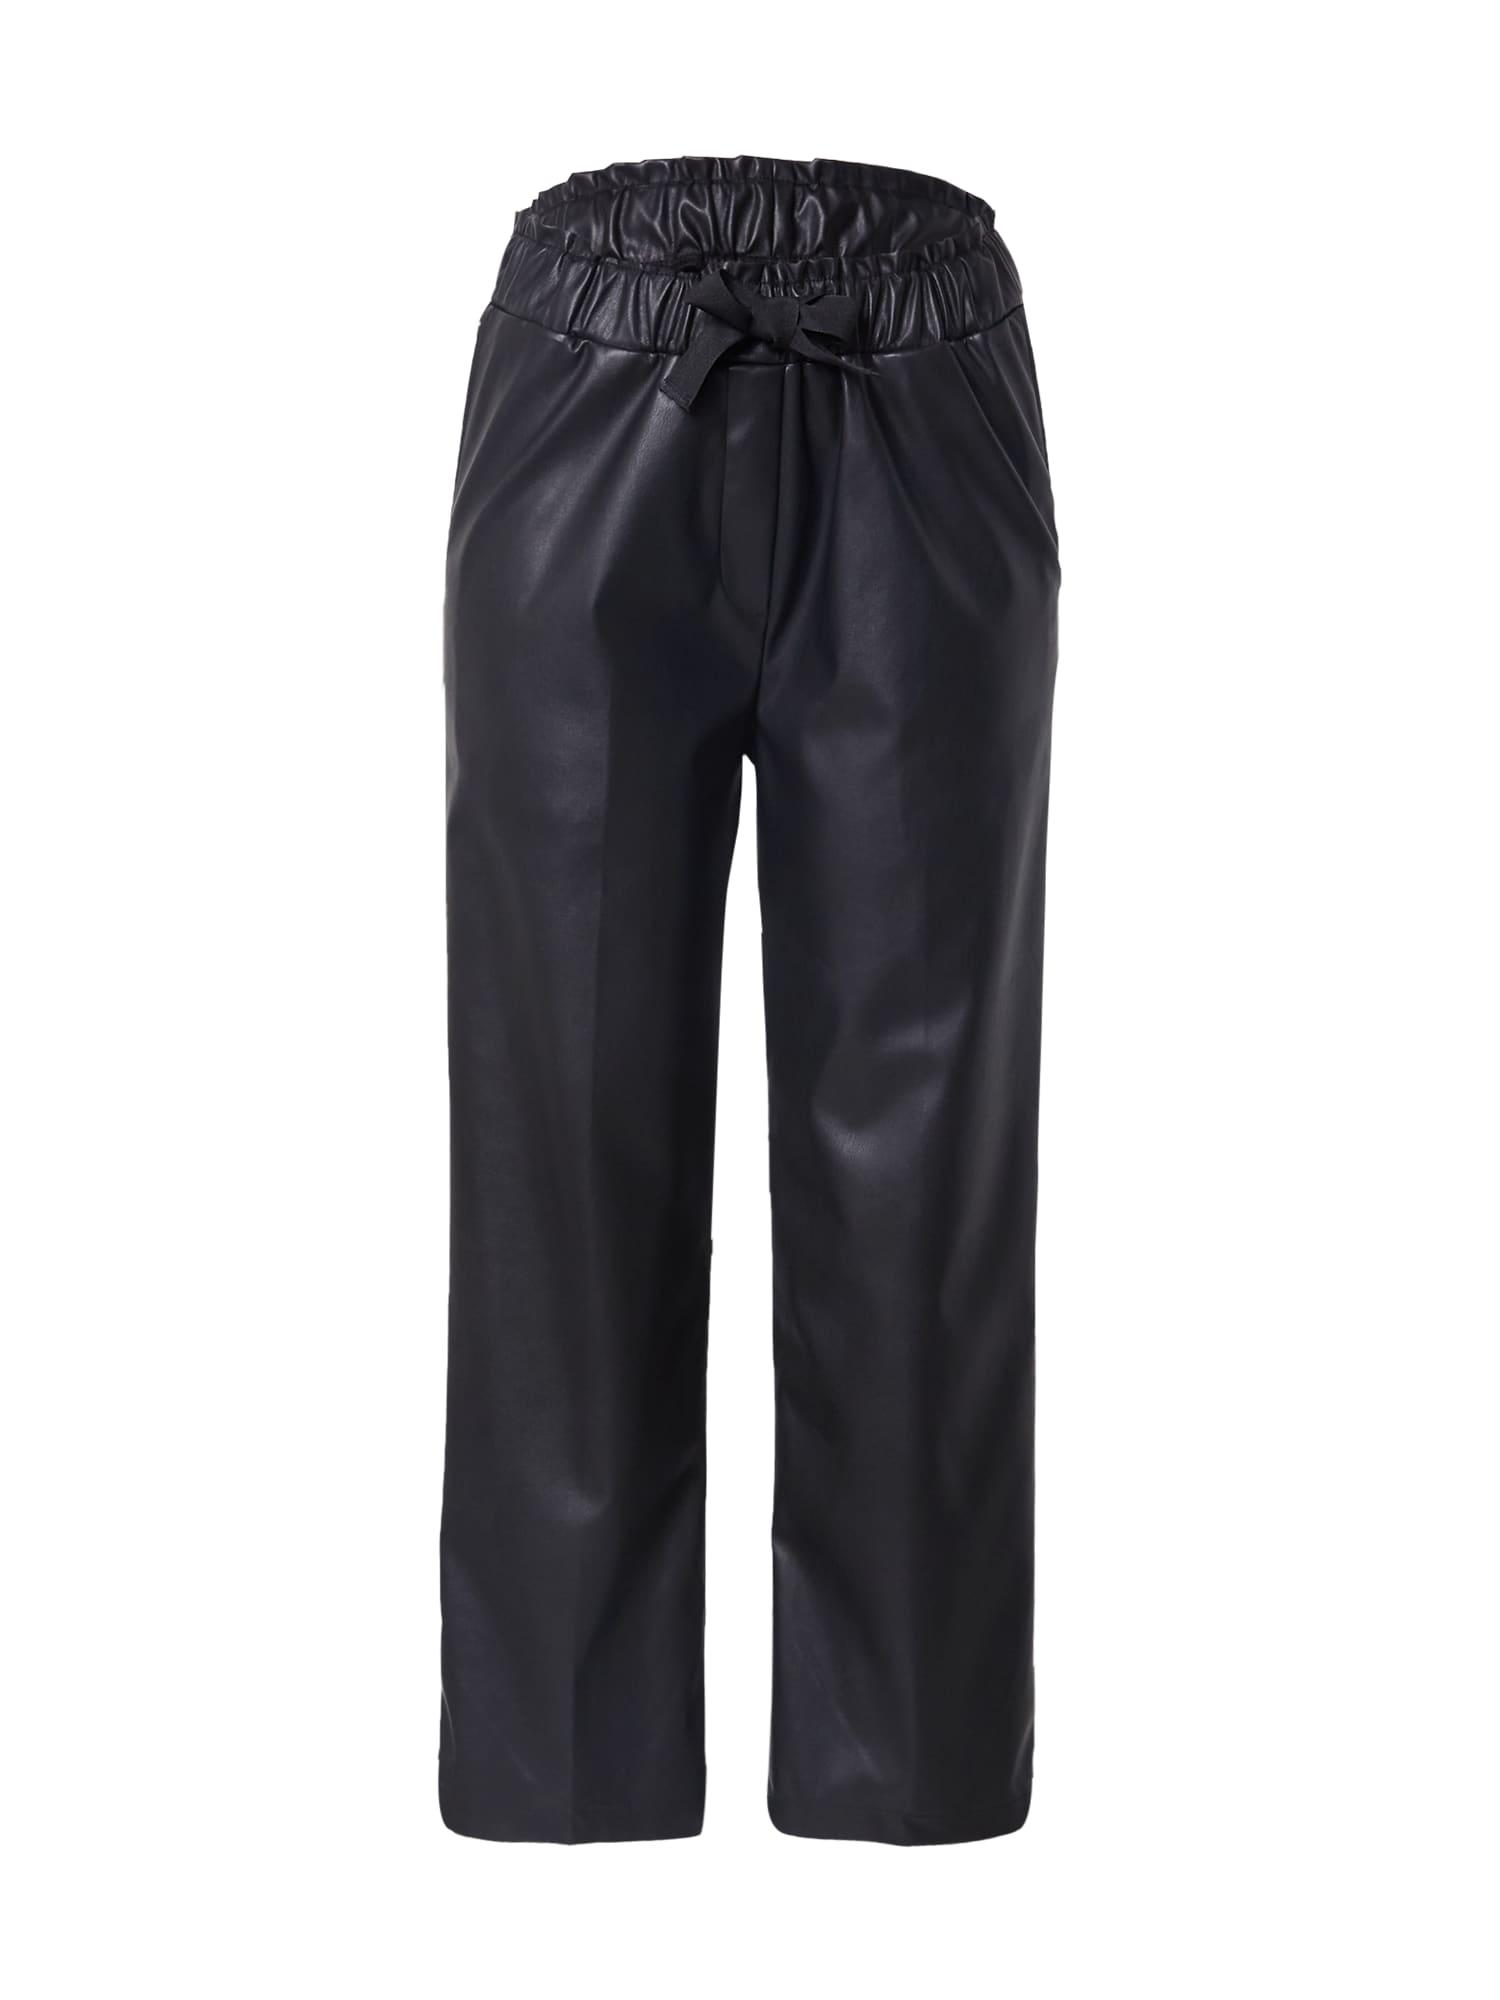 Princess Pantalon  - Noir - Taille: 36 - female